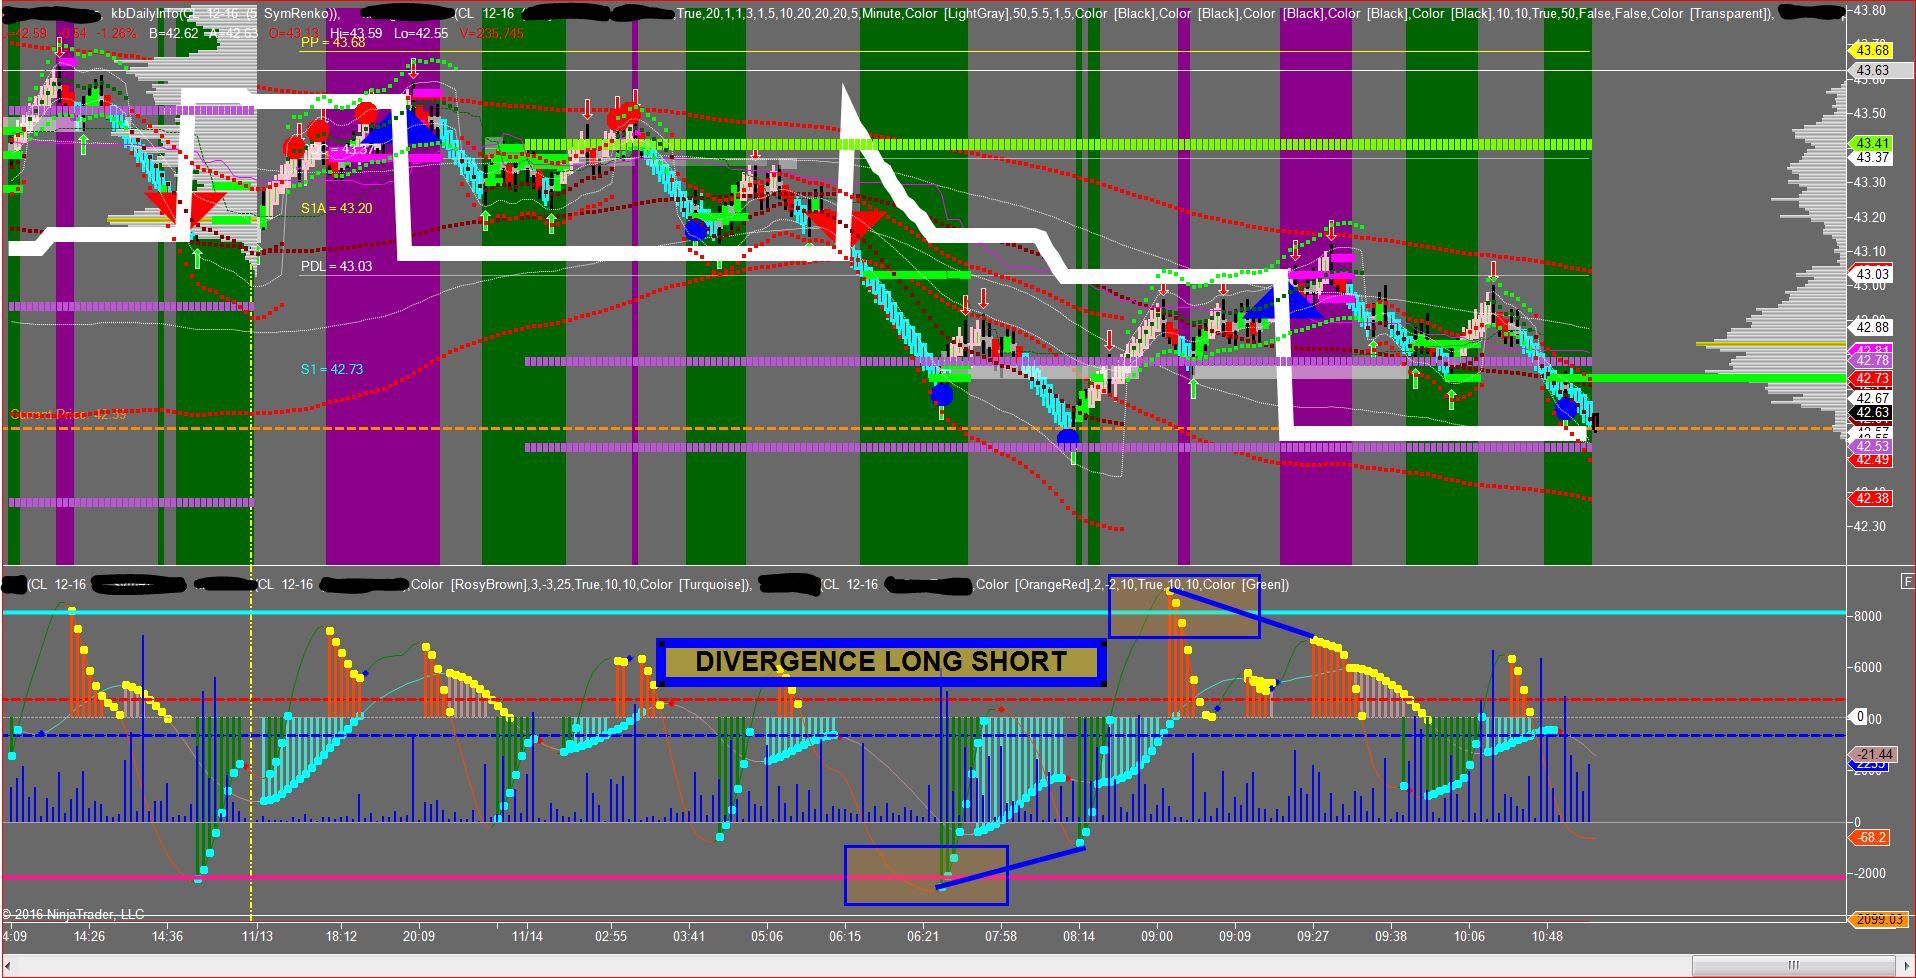 Trading sentiment indicators